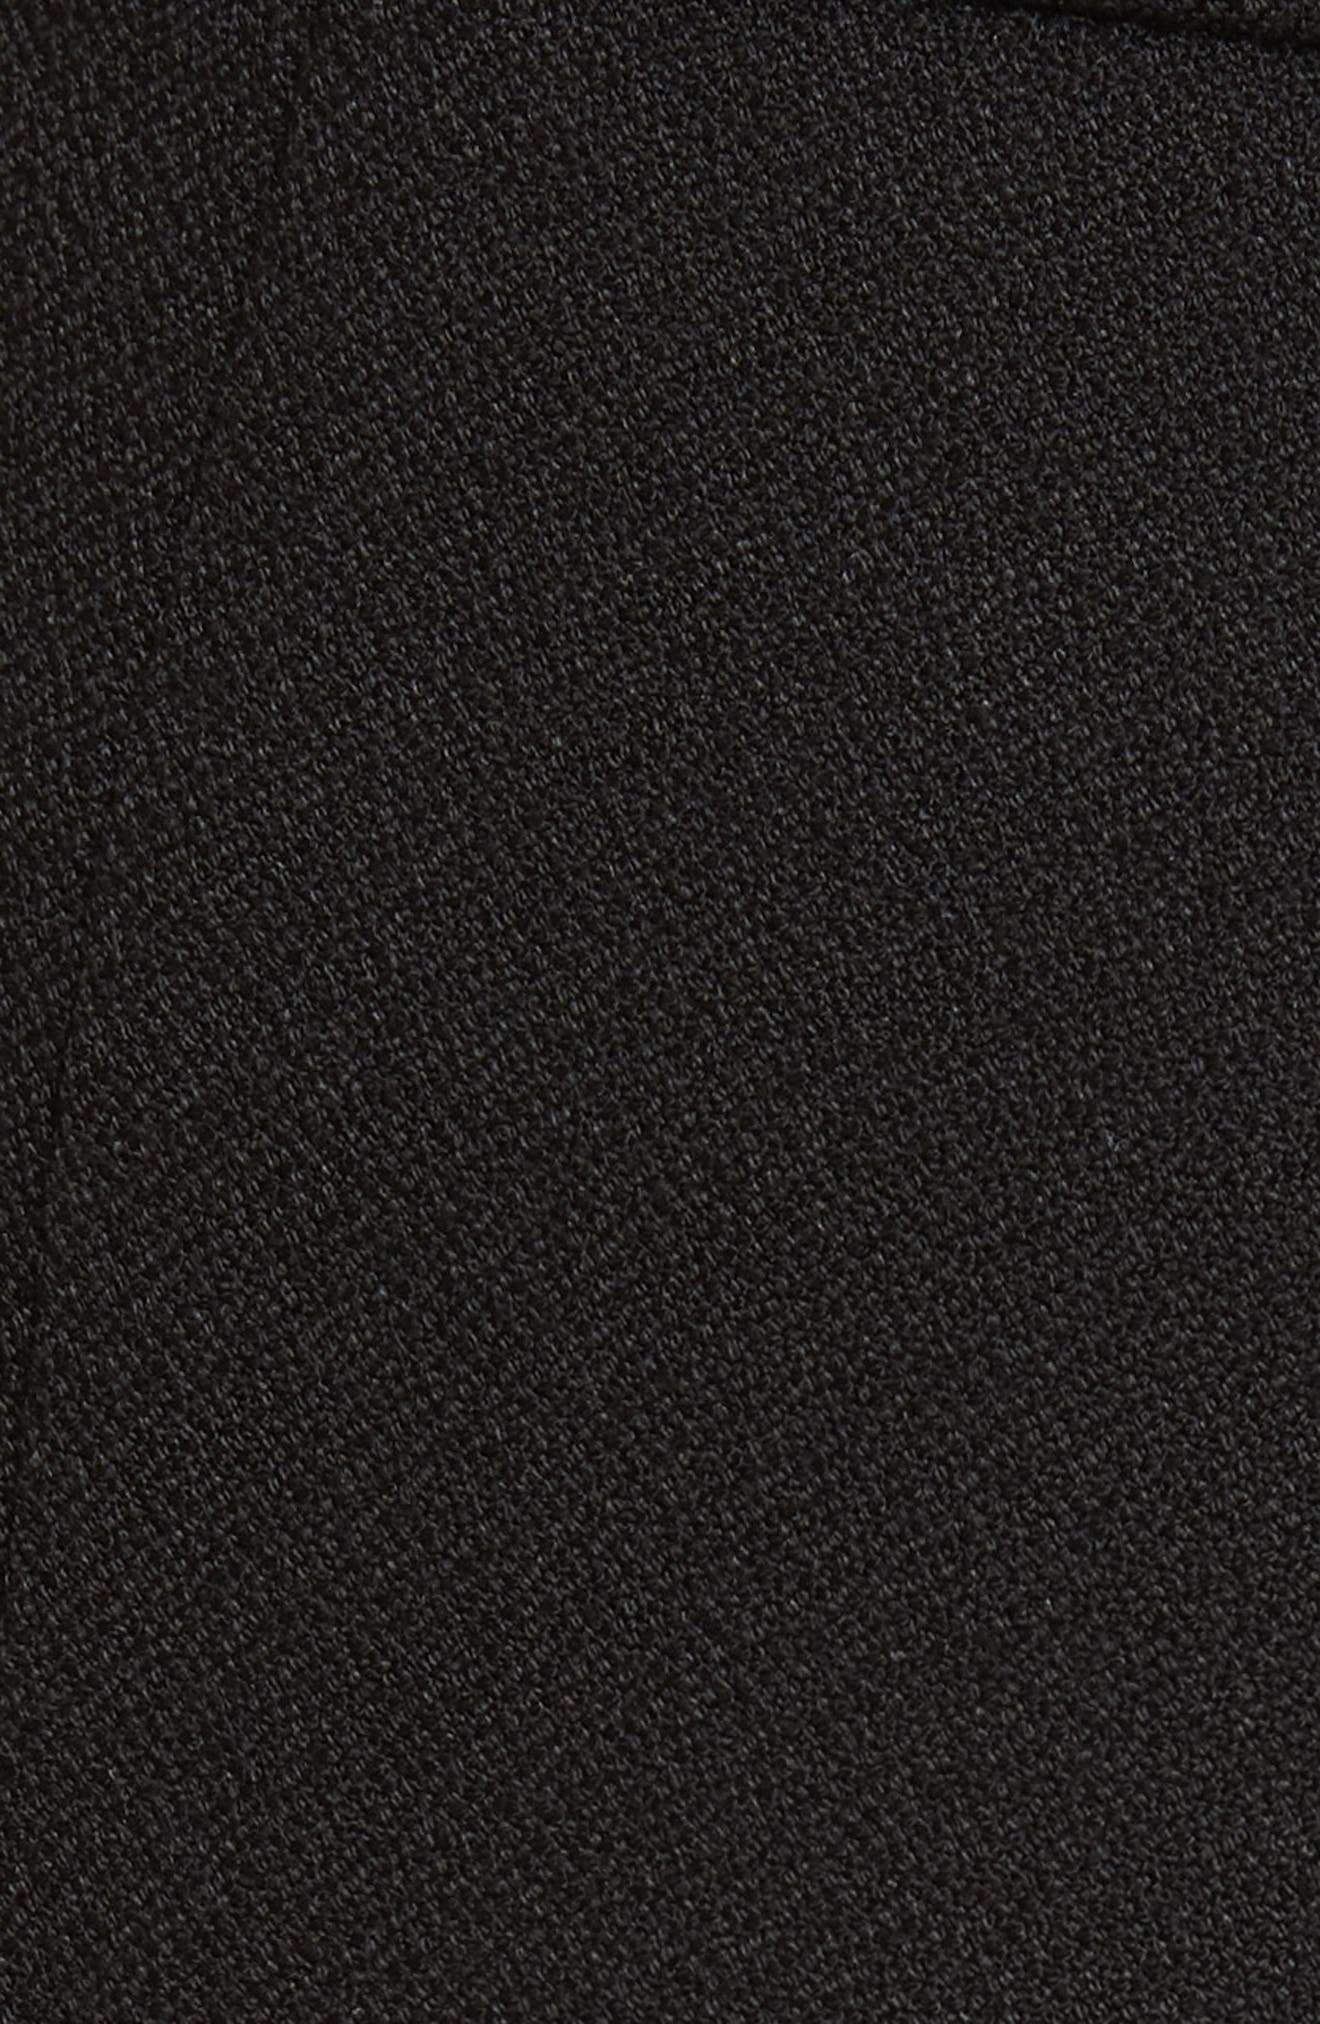 Alair Chain Detail Sailor Trousers,                             Alternate thumbnail 5, color,                             BLACK